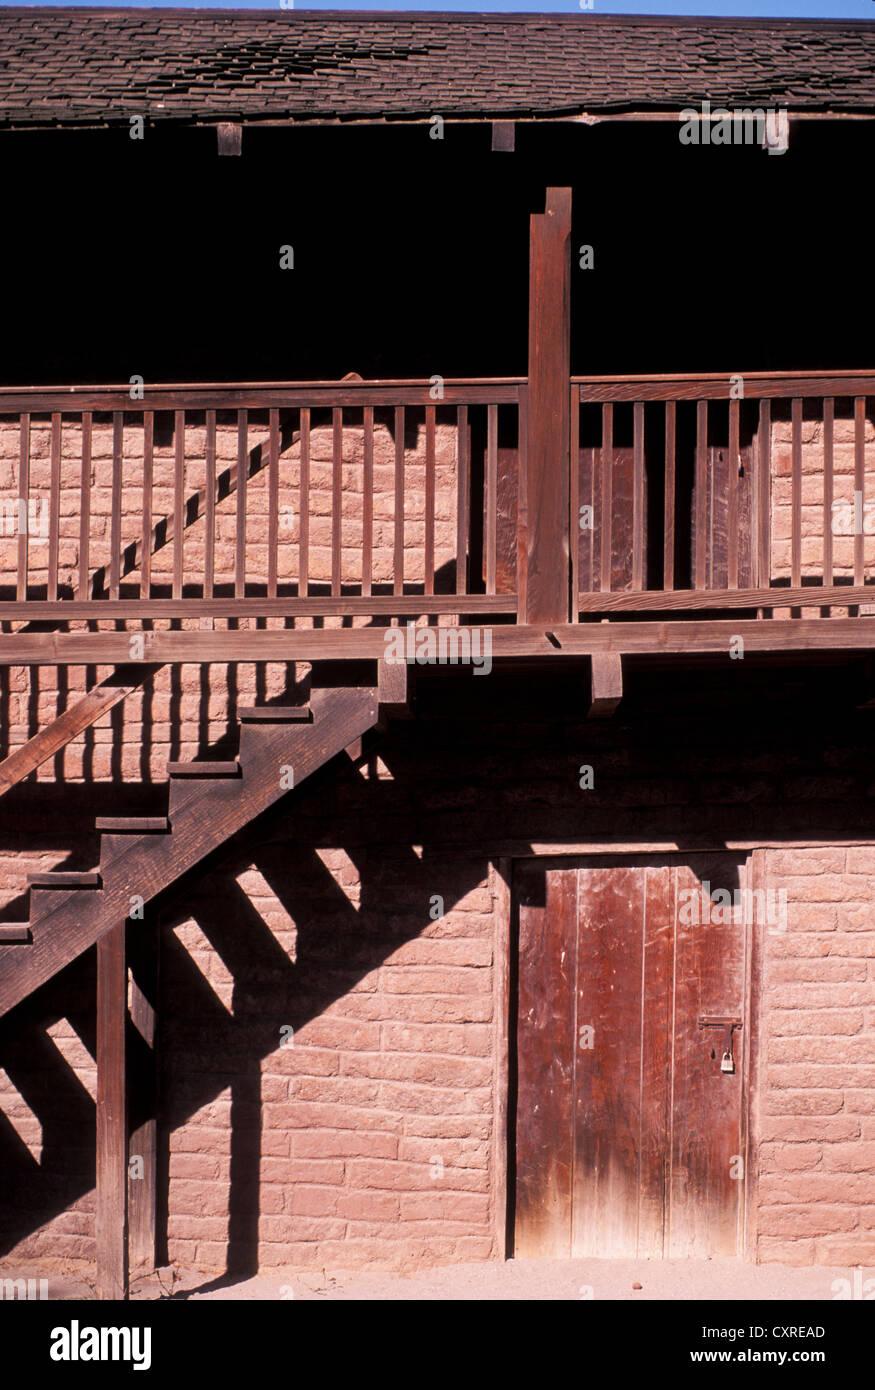 El Presidio, barracks for Mexican troops under General Vallejo built 1830s now Sonoma State Historic Plaza Sonoma - Stock Image